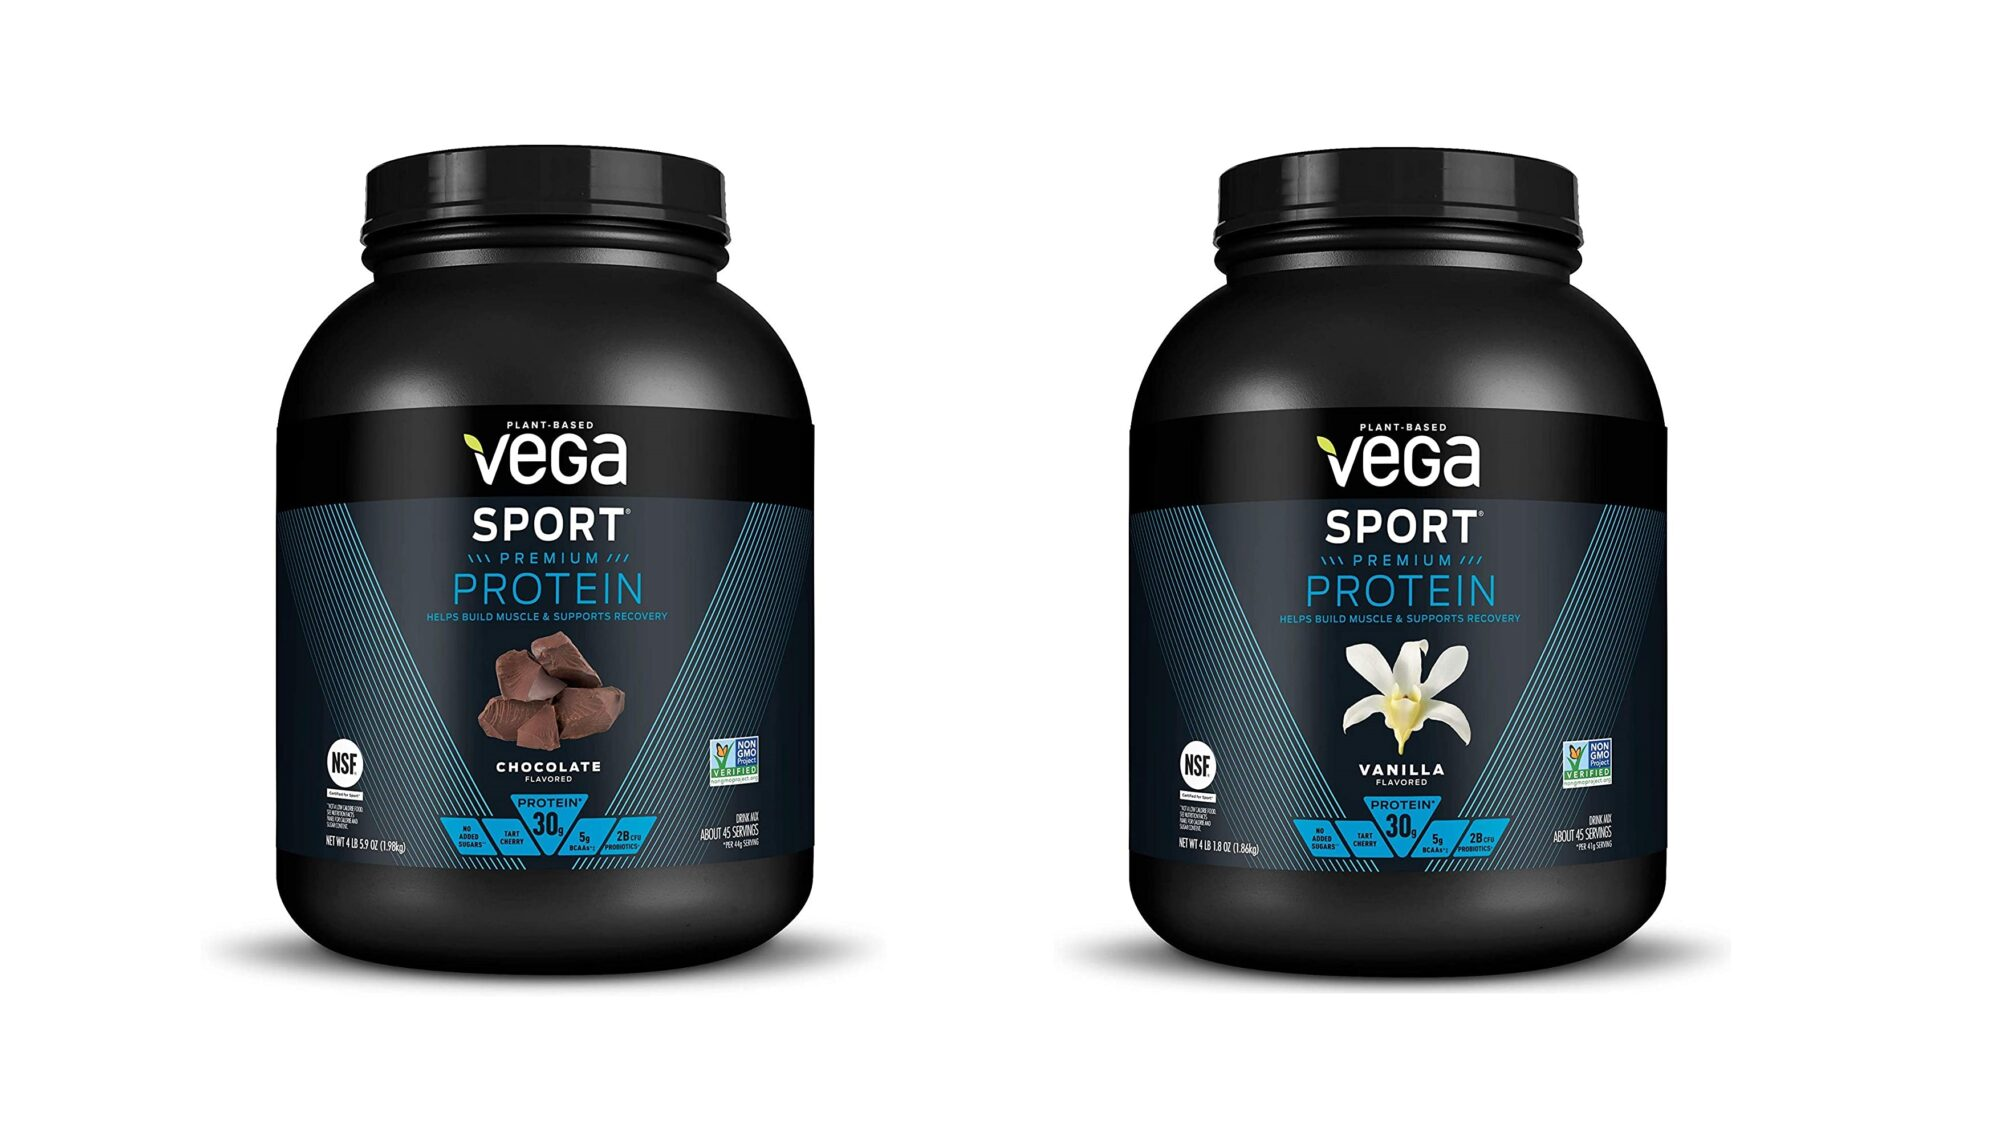 vega sport protein powder review